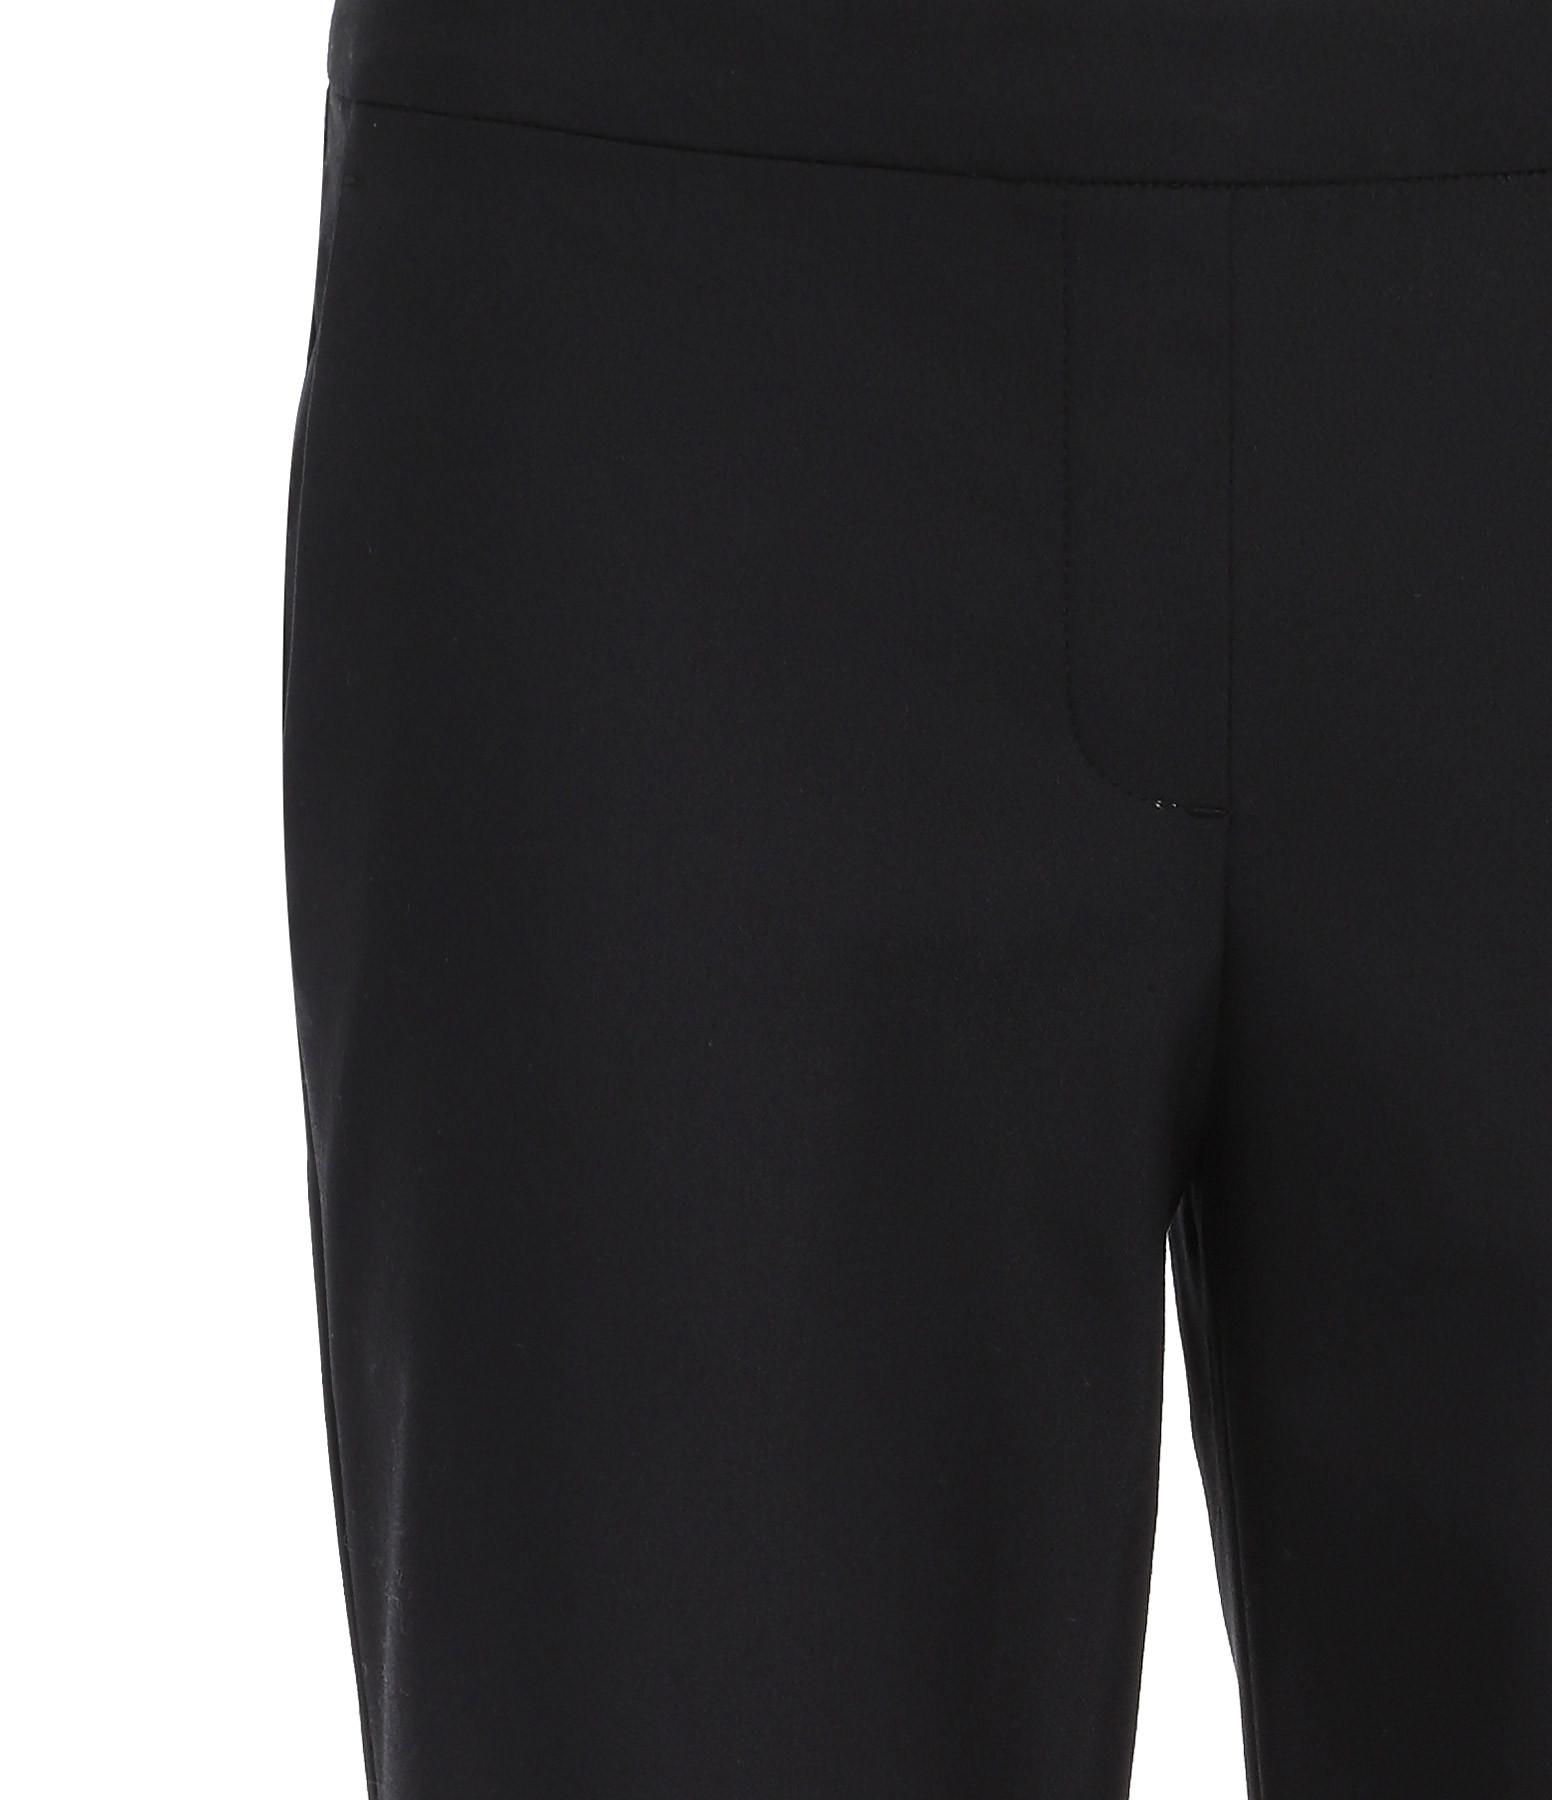 THEORY - Pantalon Thaniel Noir